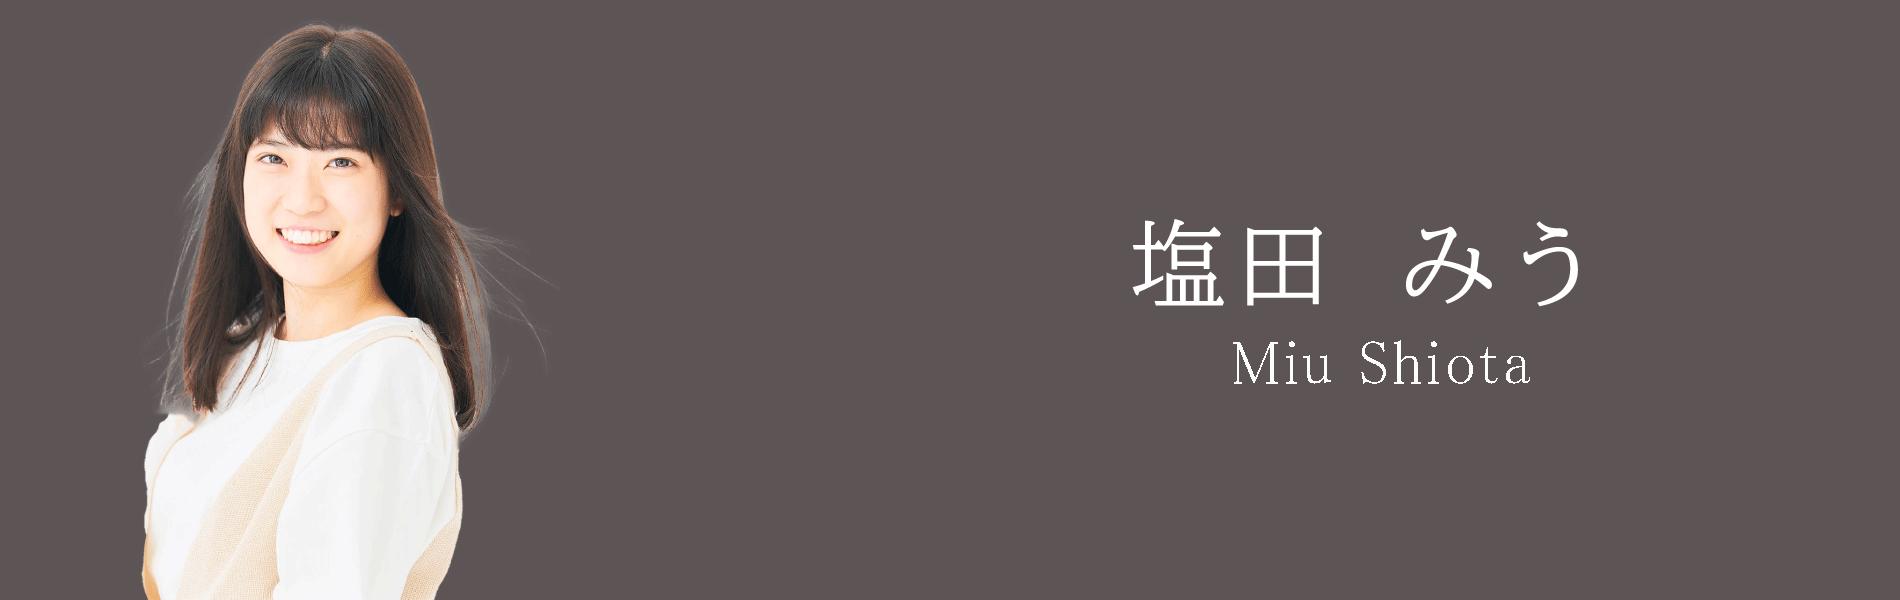 chohai-top-img